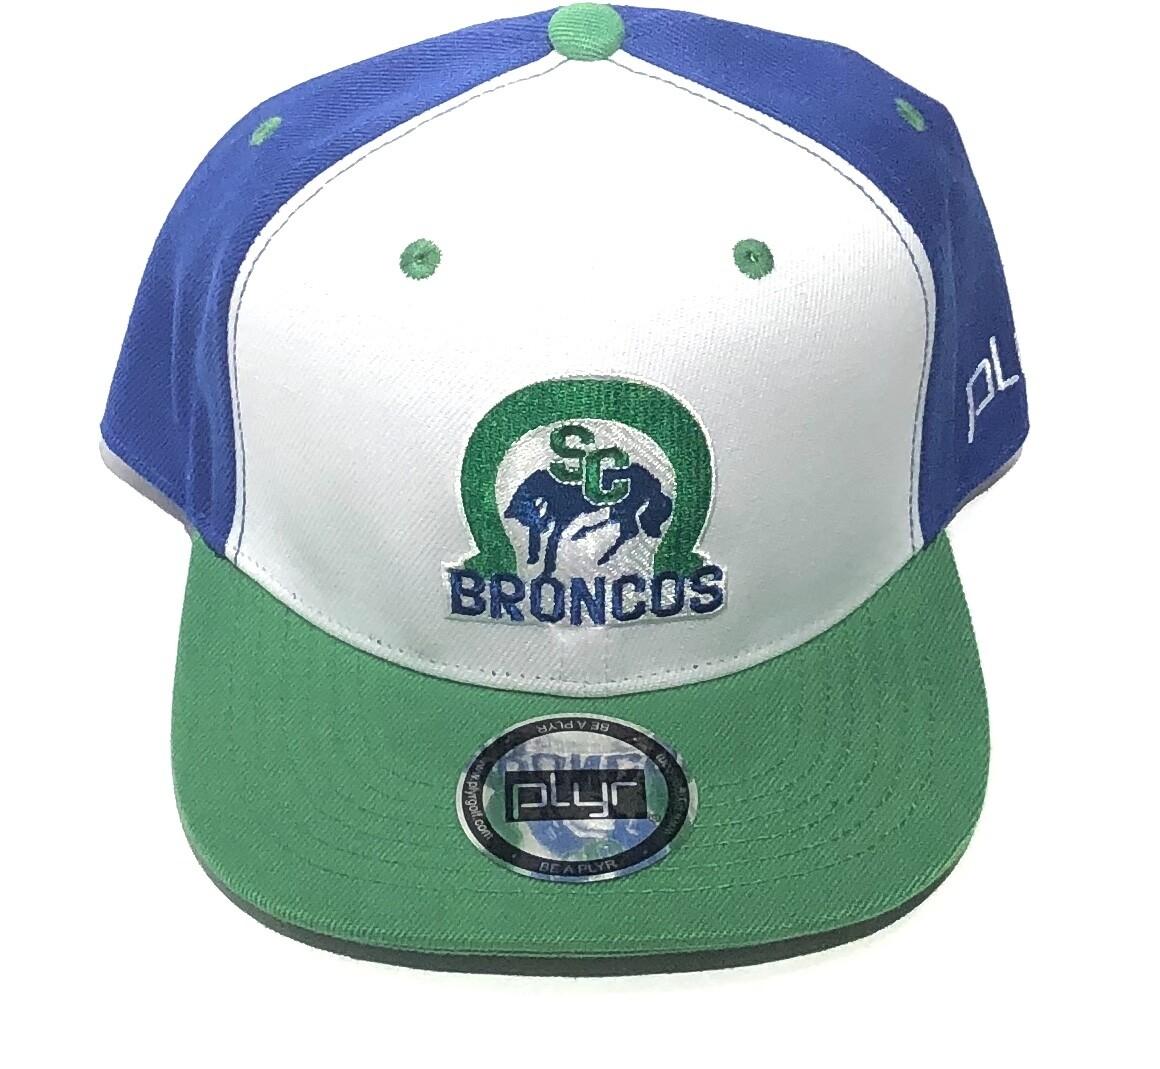 Adult Broncos Plyr Hat